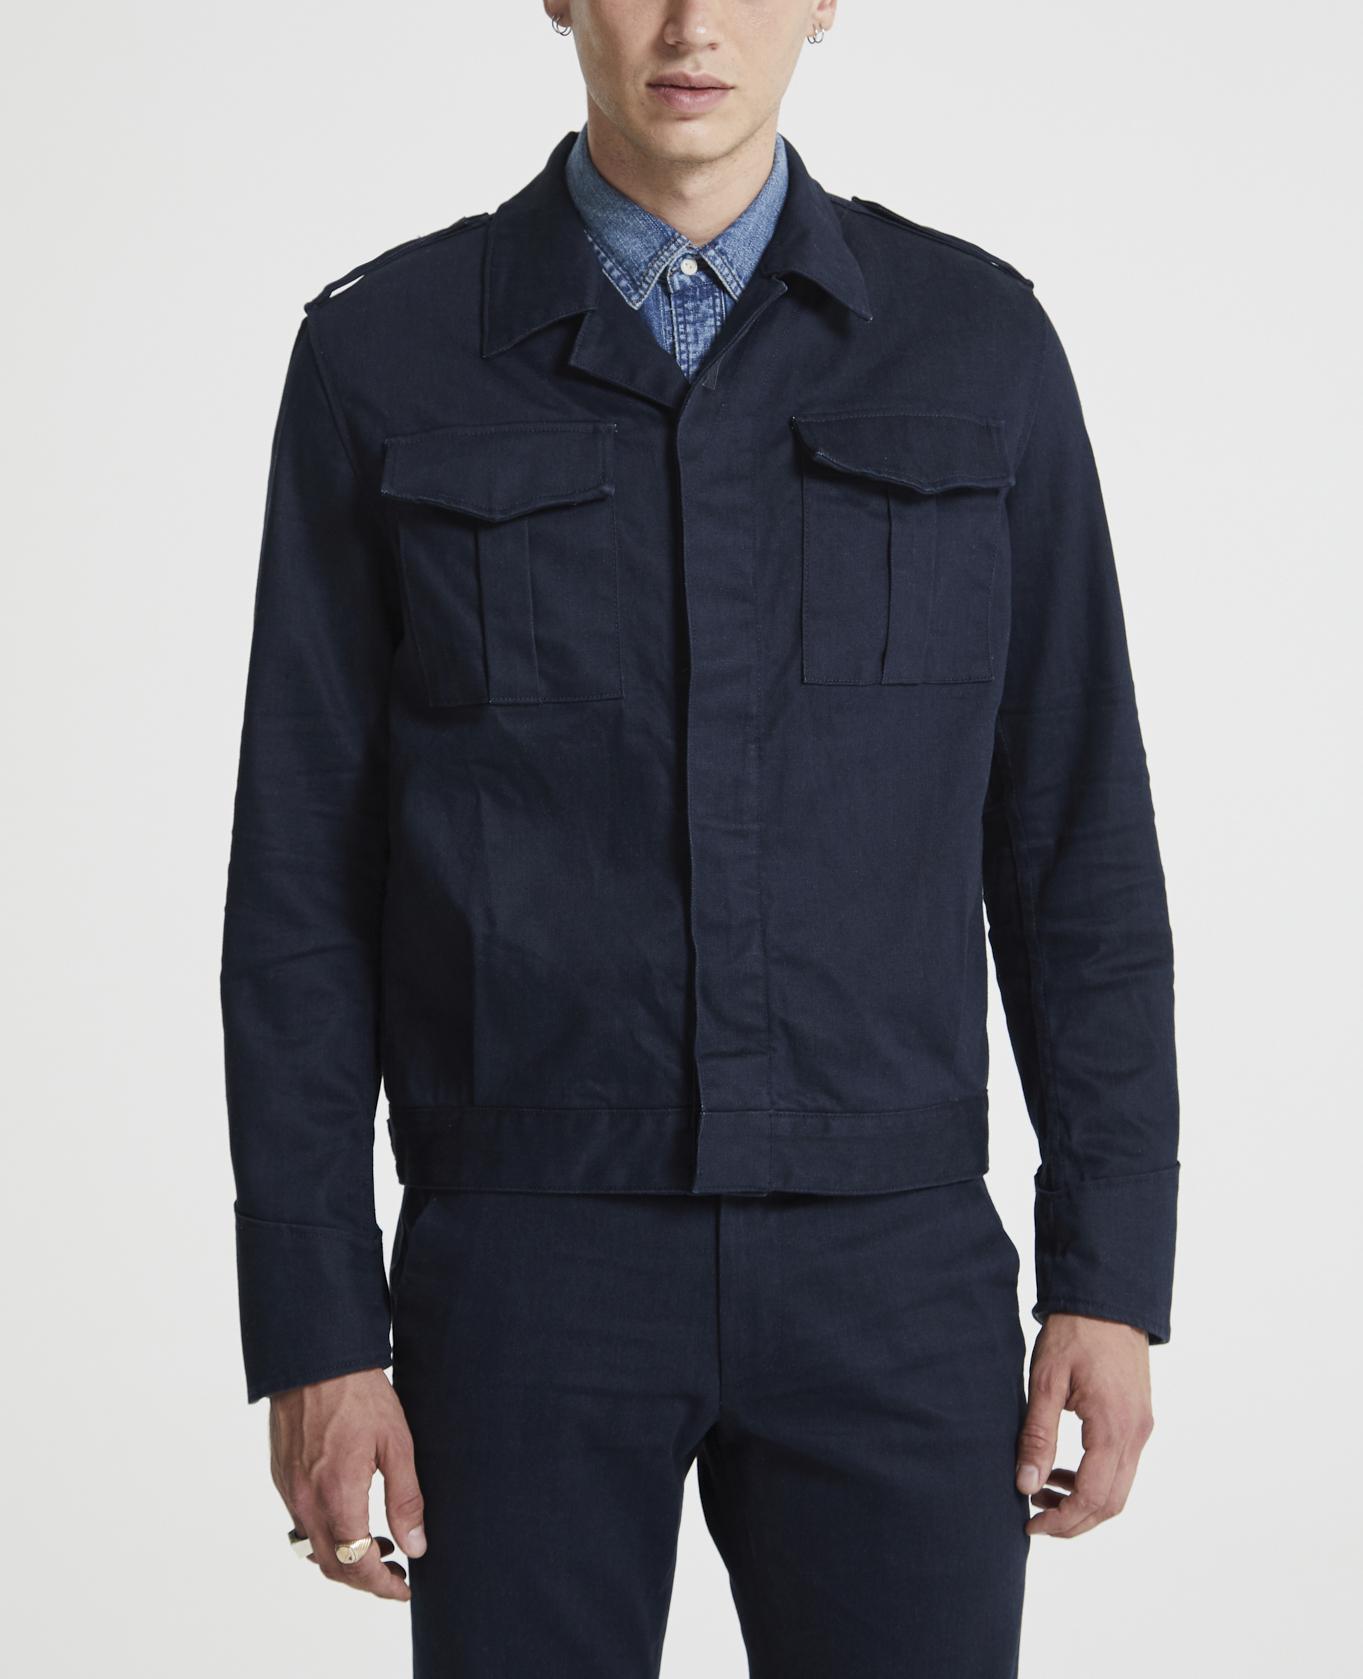 The Arrow Jacket